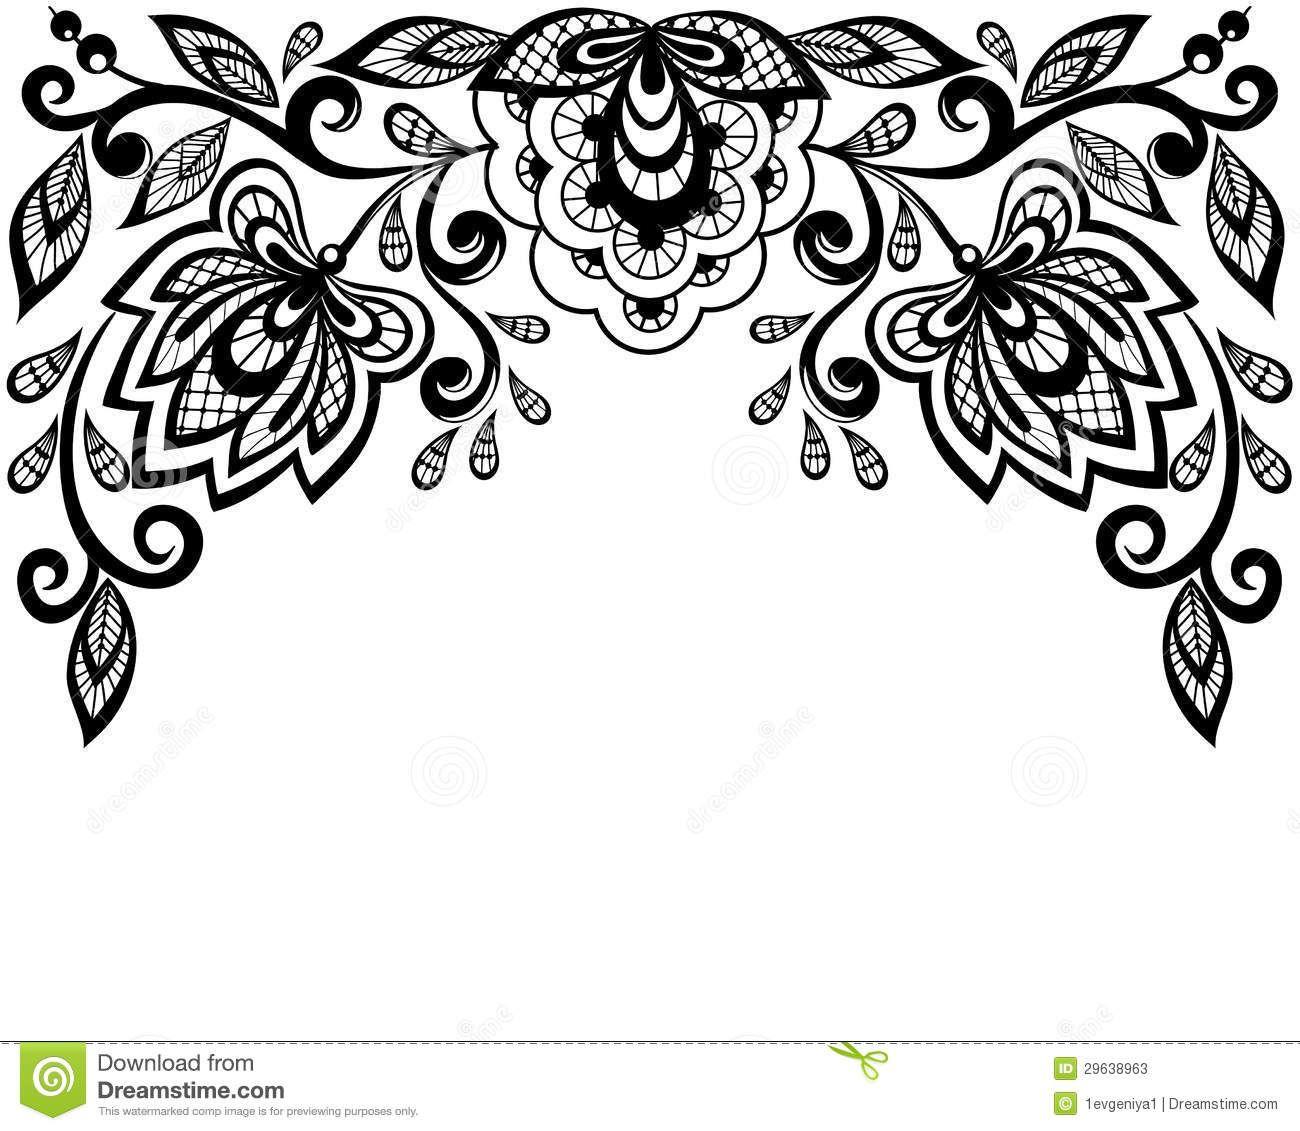 Leaves Clip Art Black And White Border | Clipart Panda - Free - Free Printable Lace Stencil